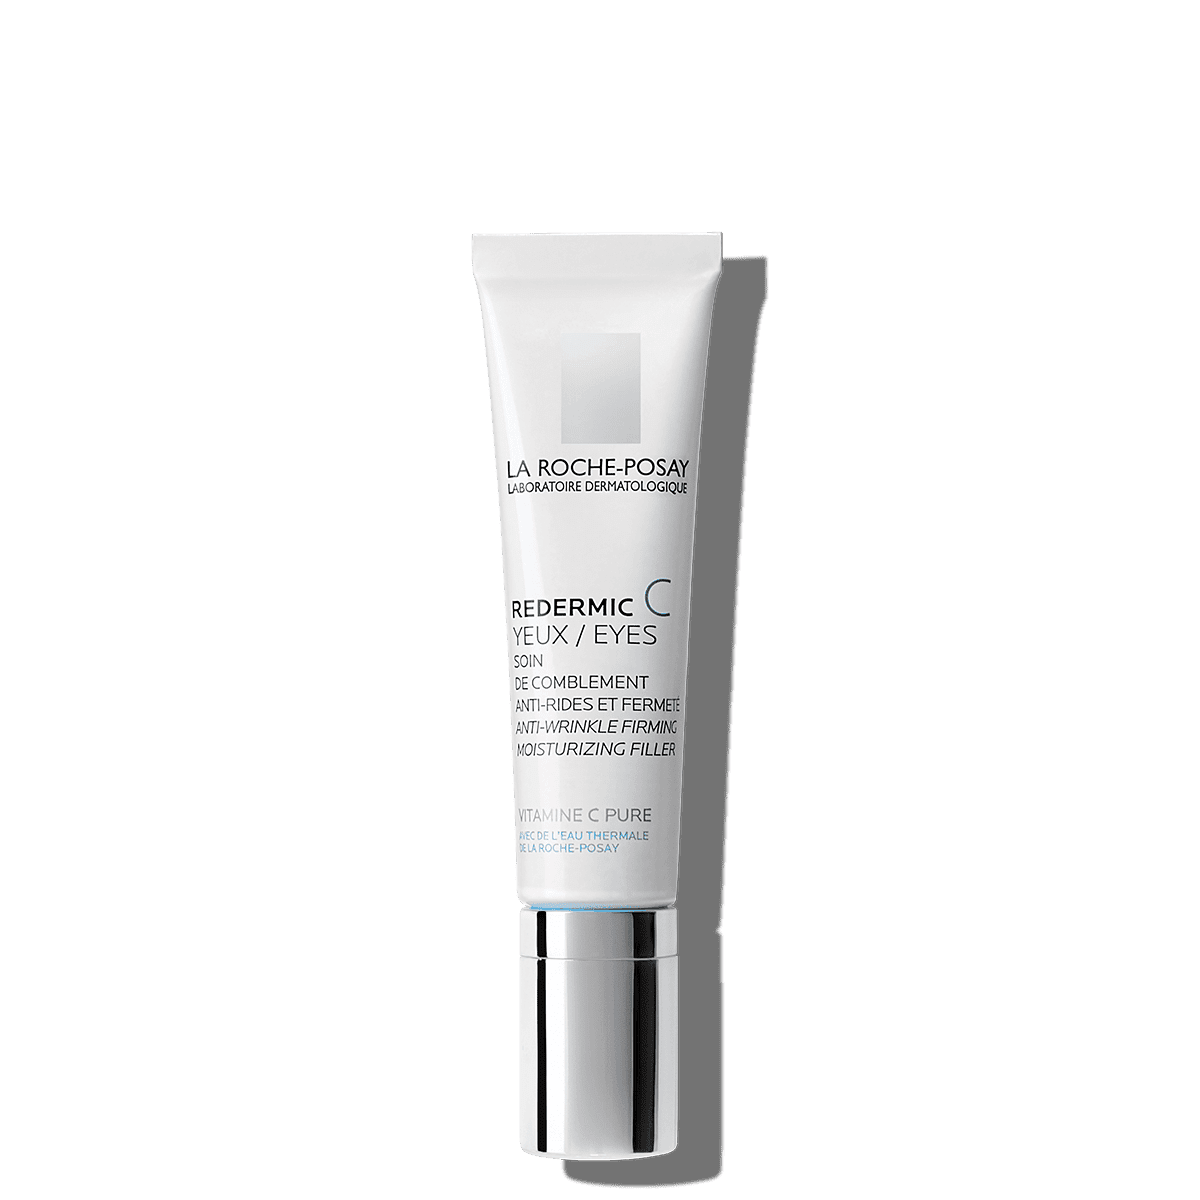 La Roche Posay ProductPage Anti Aging Eye Cream Redermic C Anti Wrinkl